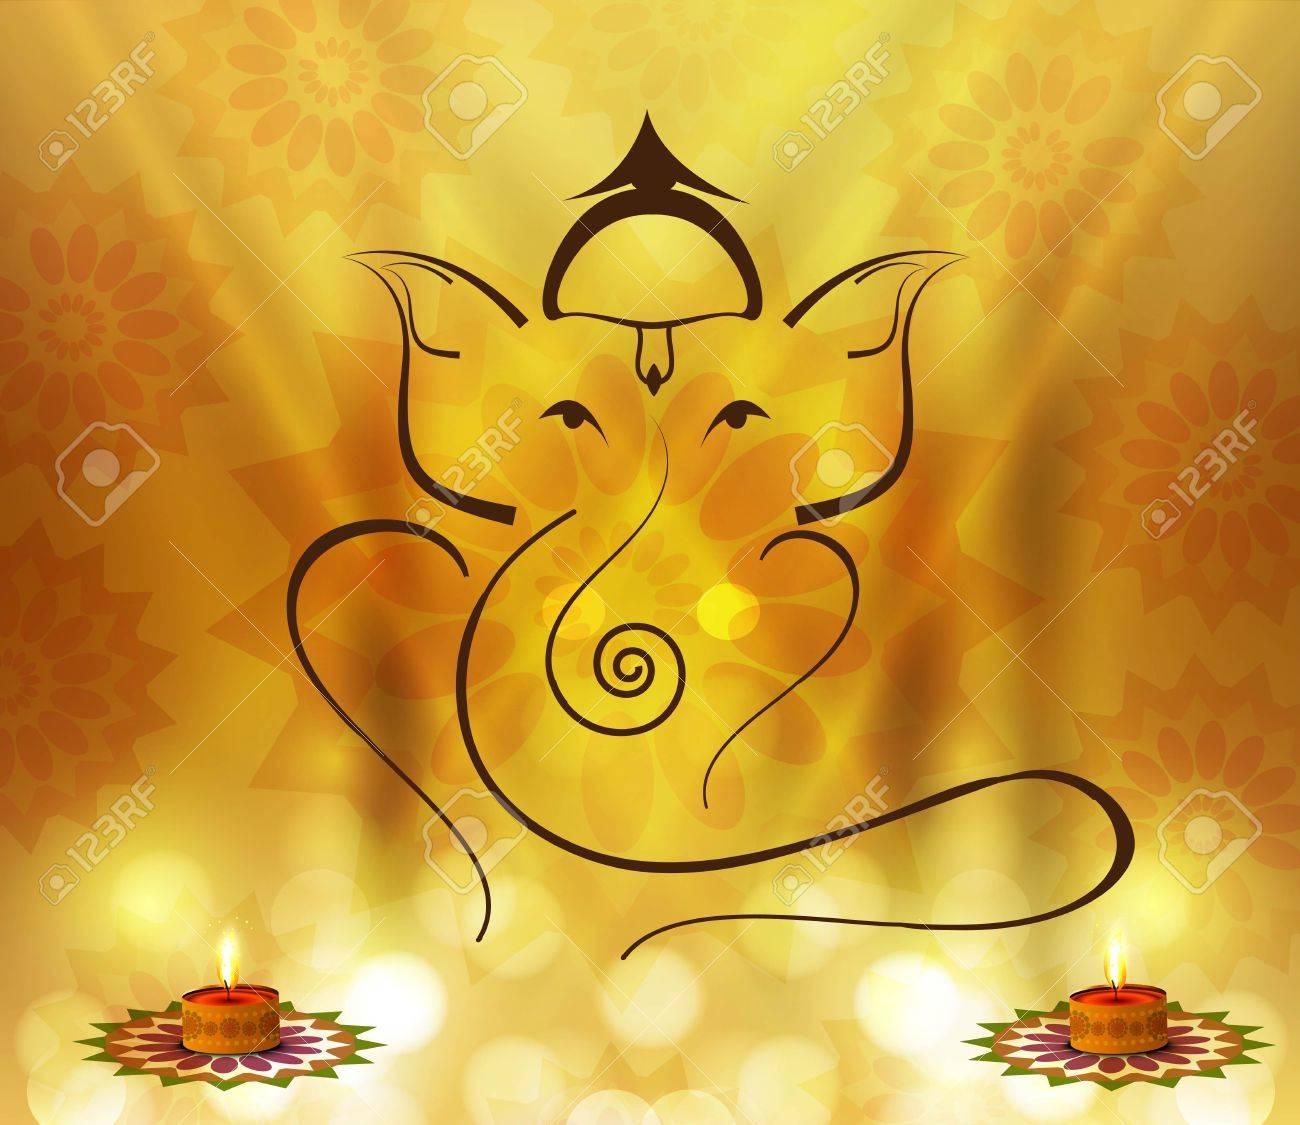 Beautiful Artistic colorful Hindu Lord Ganesha design Stock Vector - 17946044